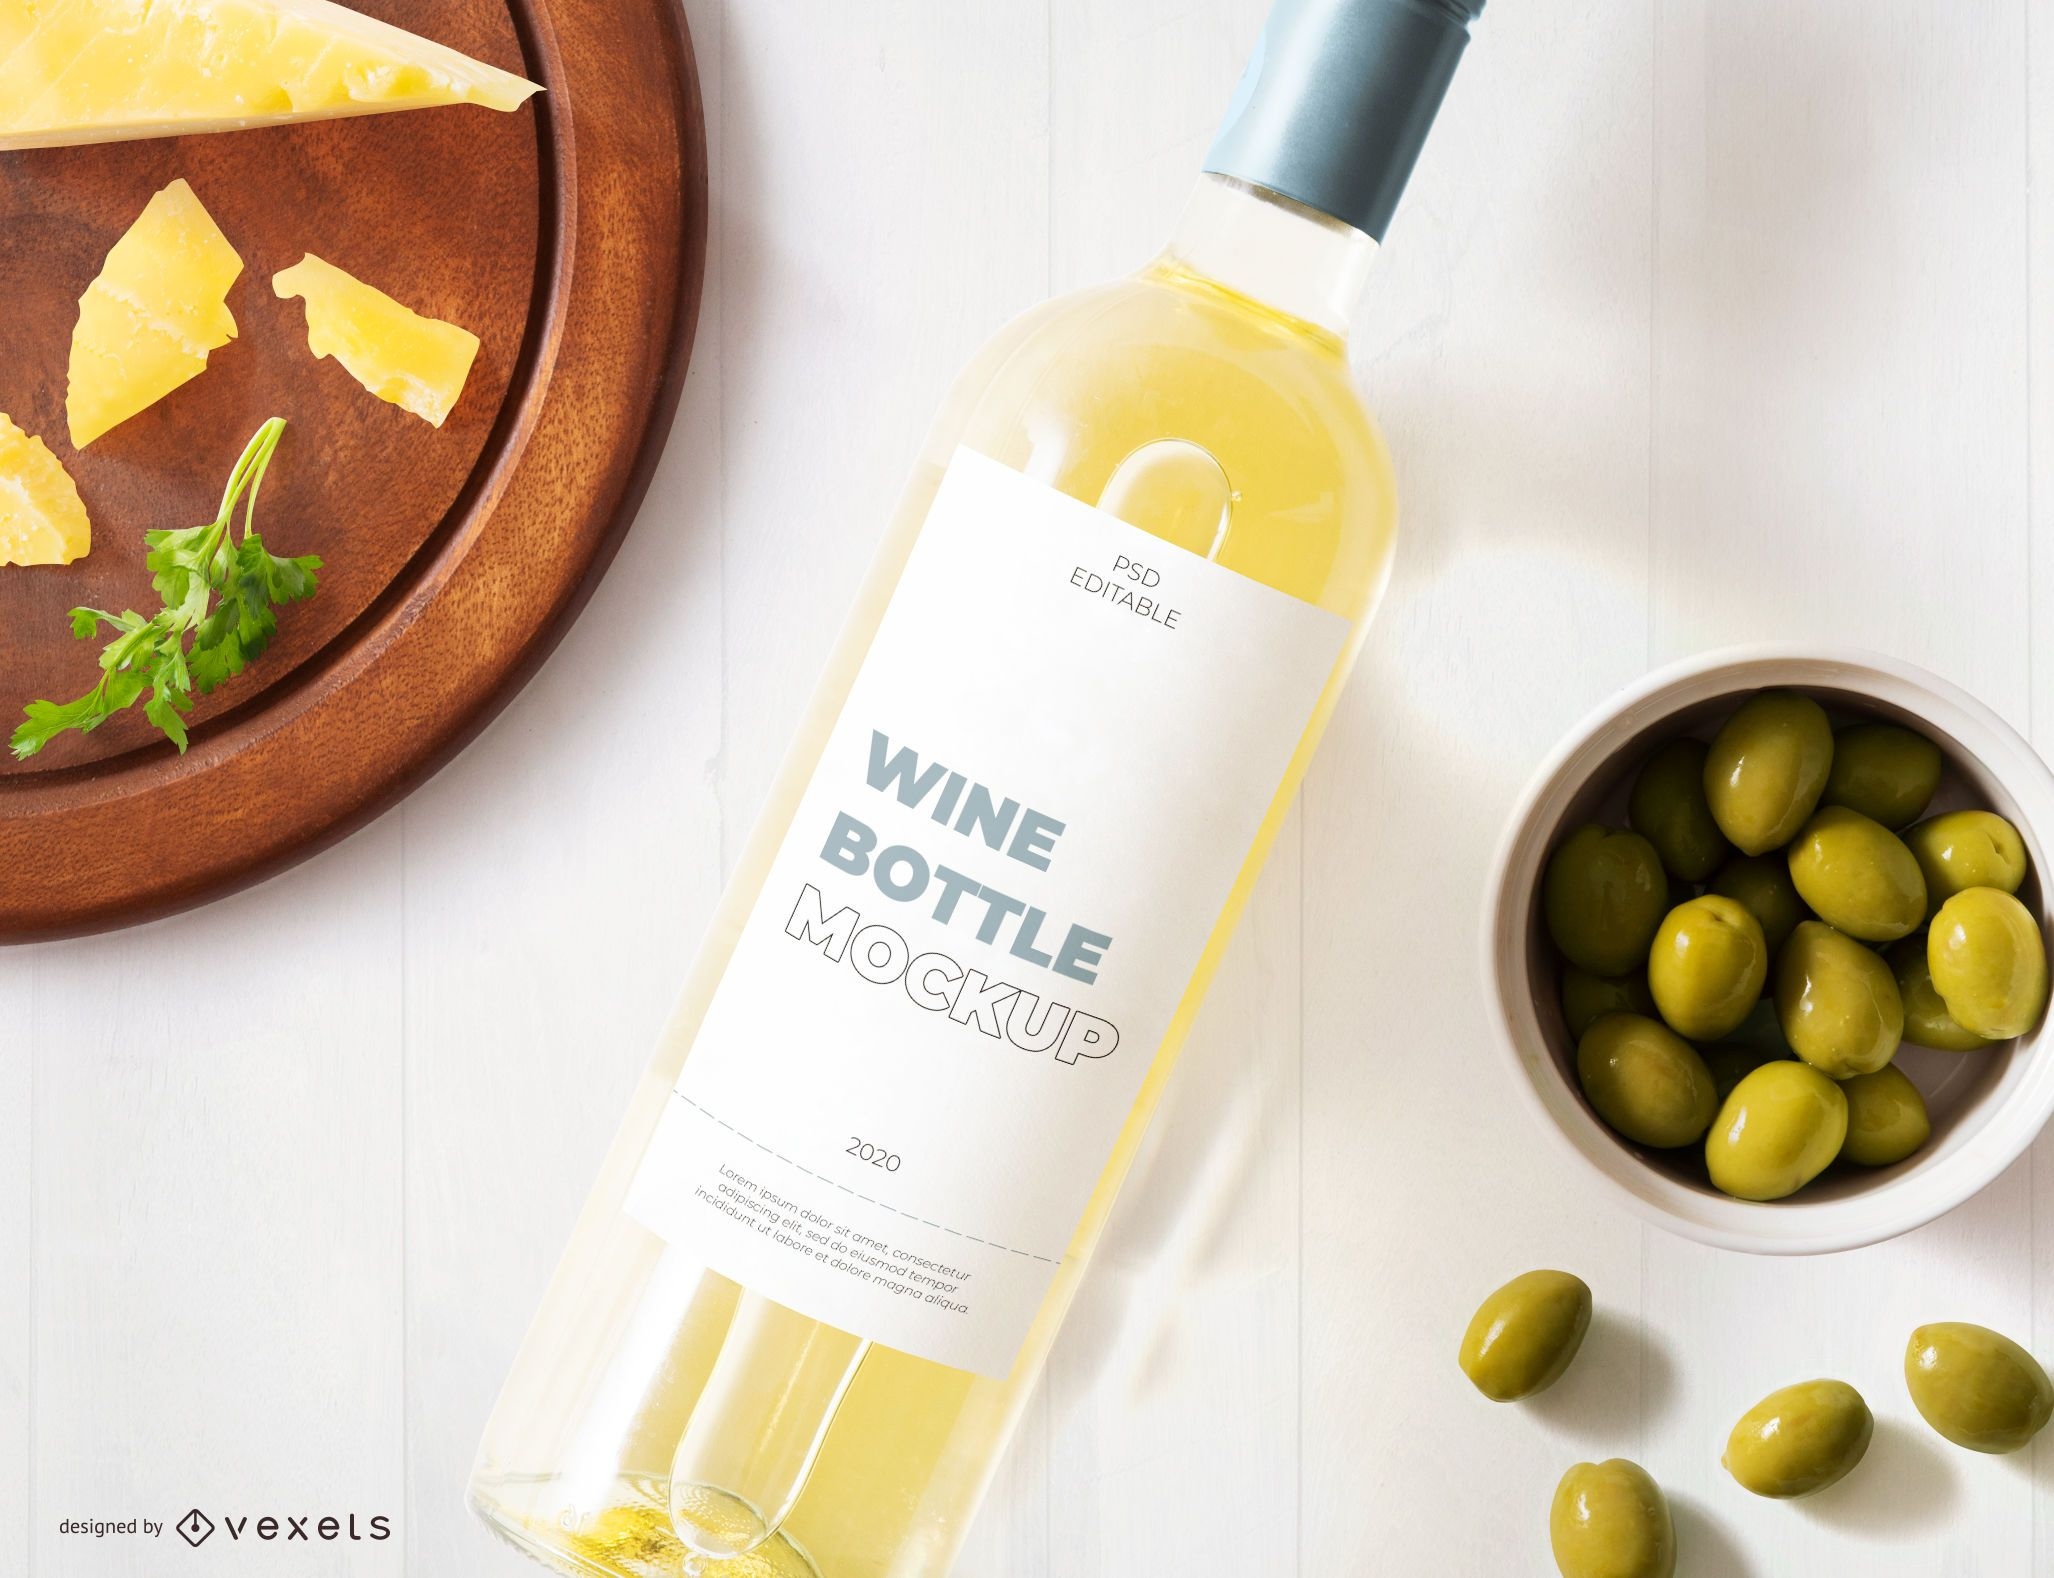 Maqueta de etiqueta de botella de vino blanco